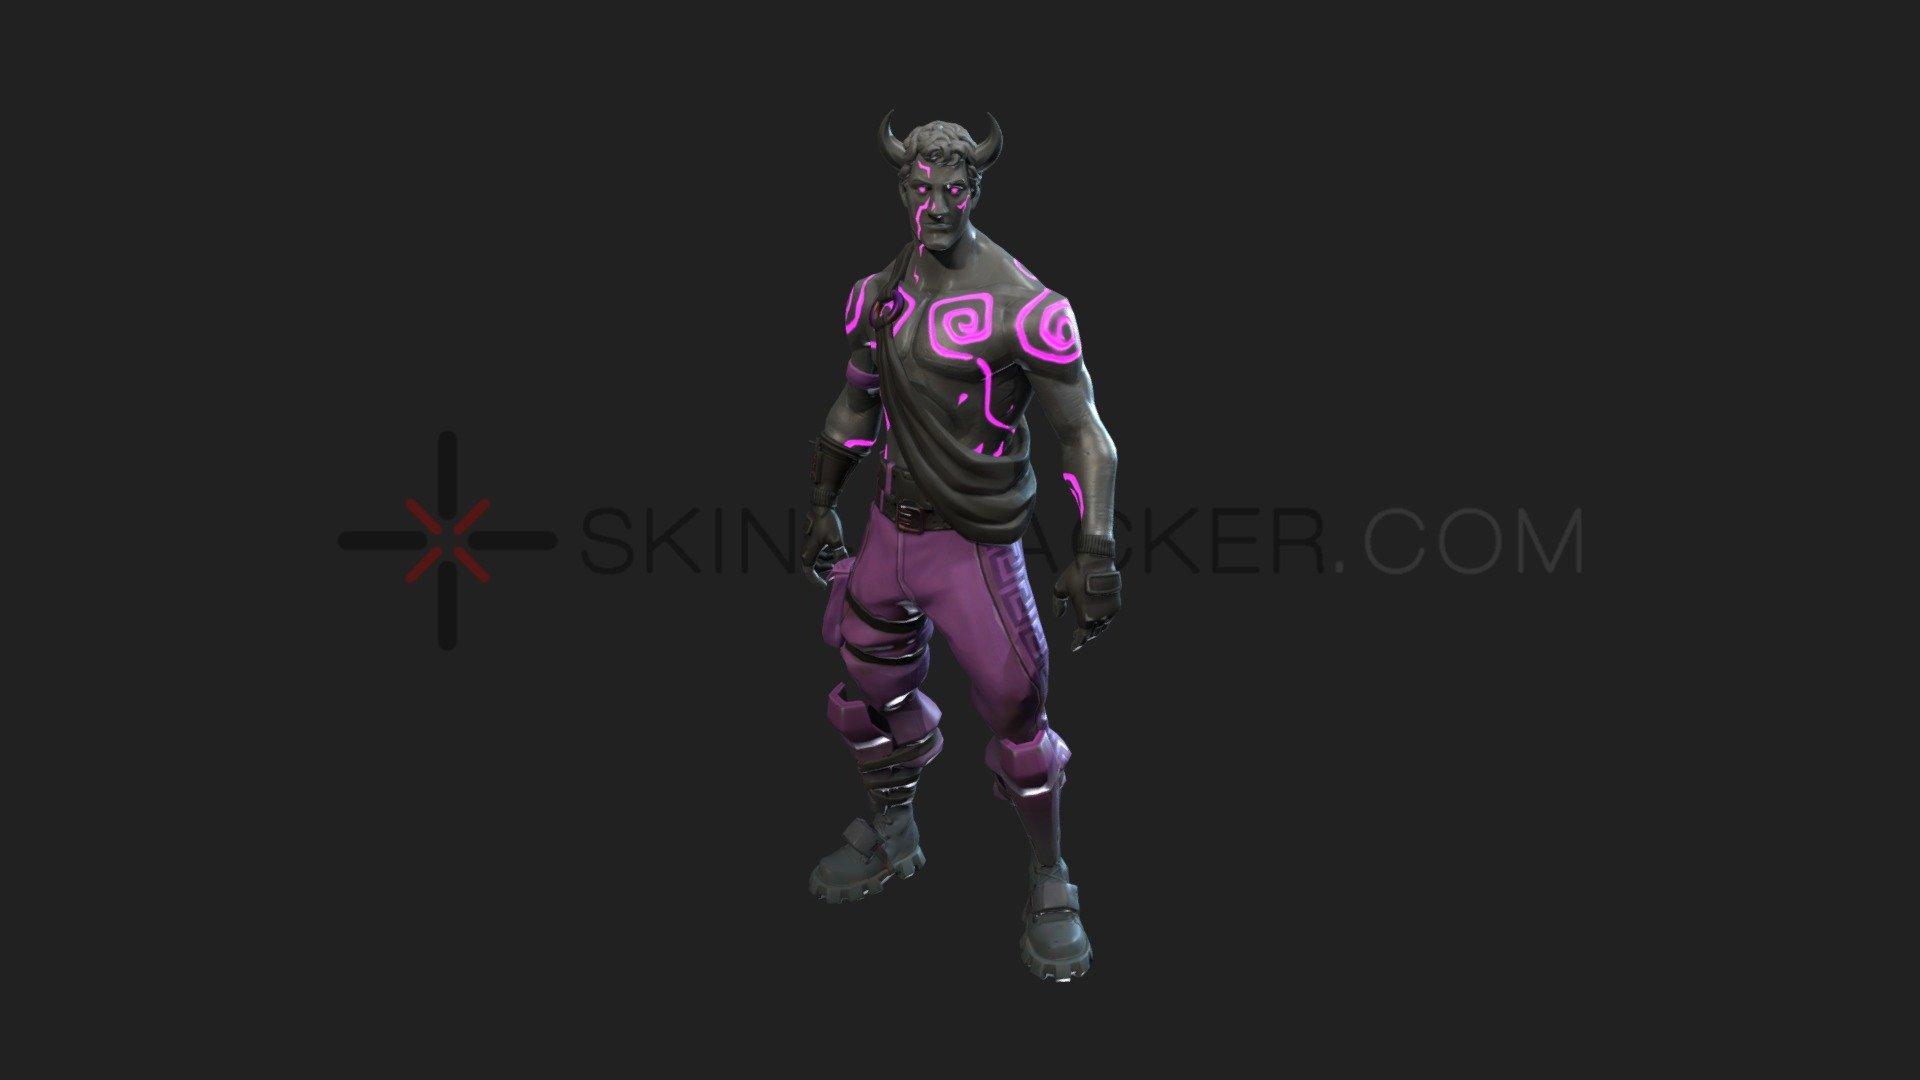 Fortnite Fallen Love Ranger 3d Model By Skin Tracker Stairwave 5c544a2 Sketchfab